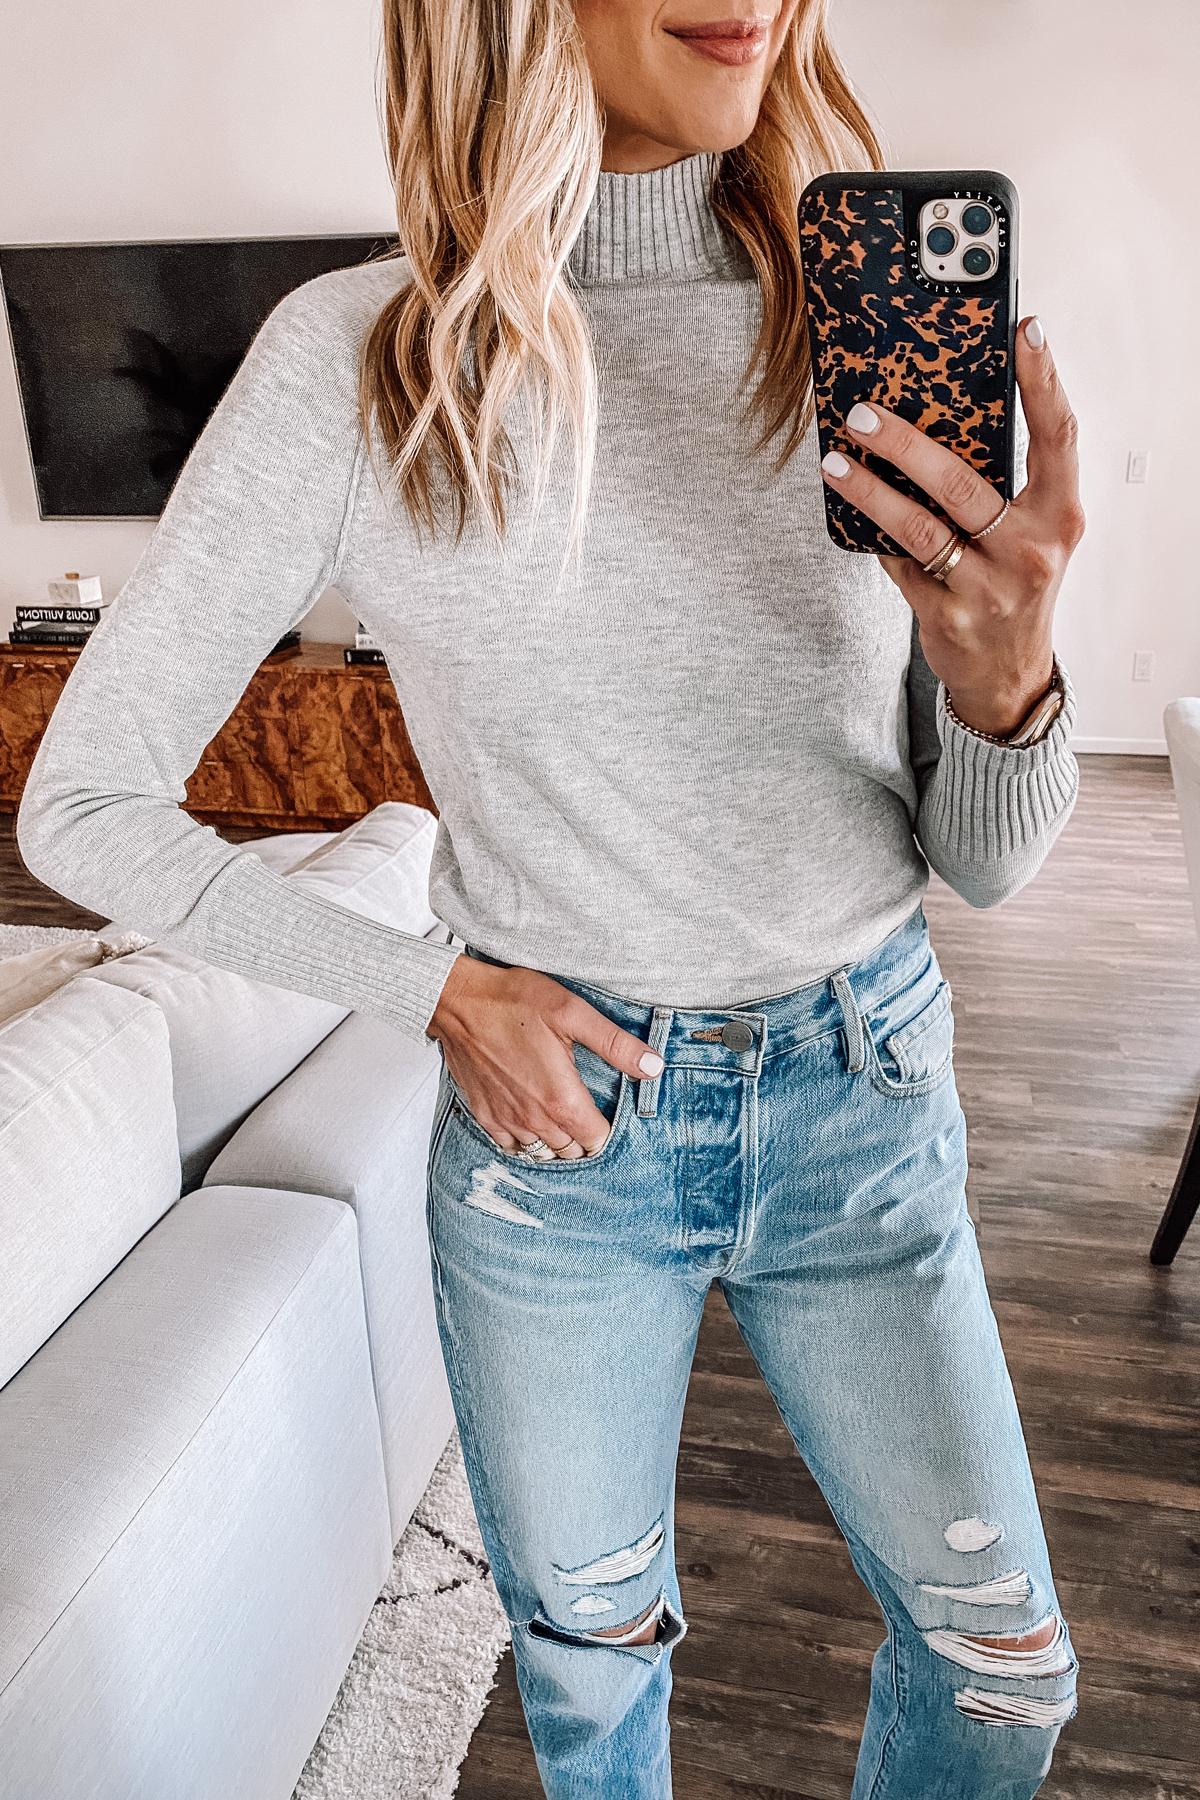 Fashion Jackson Wearing Grey Mock Neck Amazon Sweater Ripped Jeans